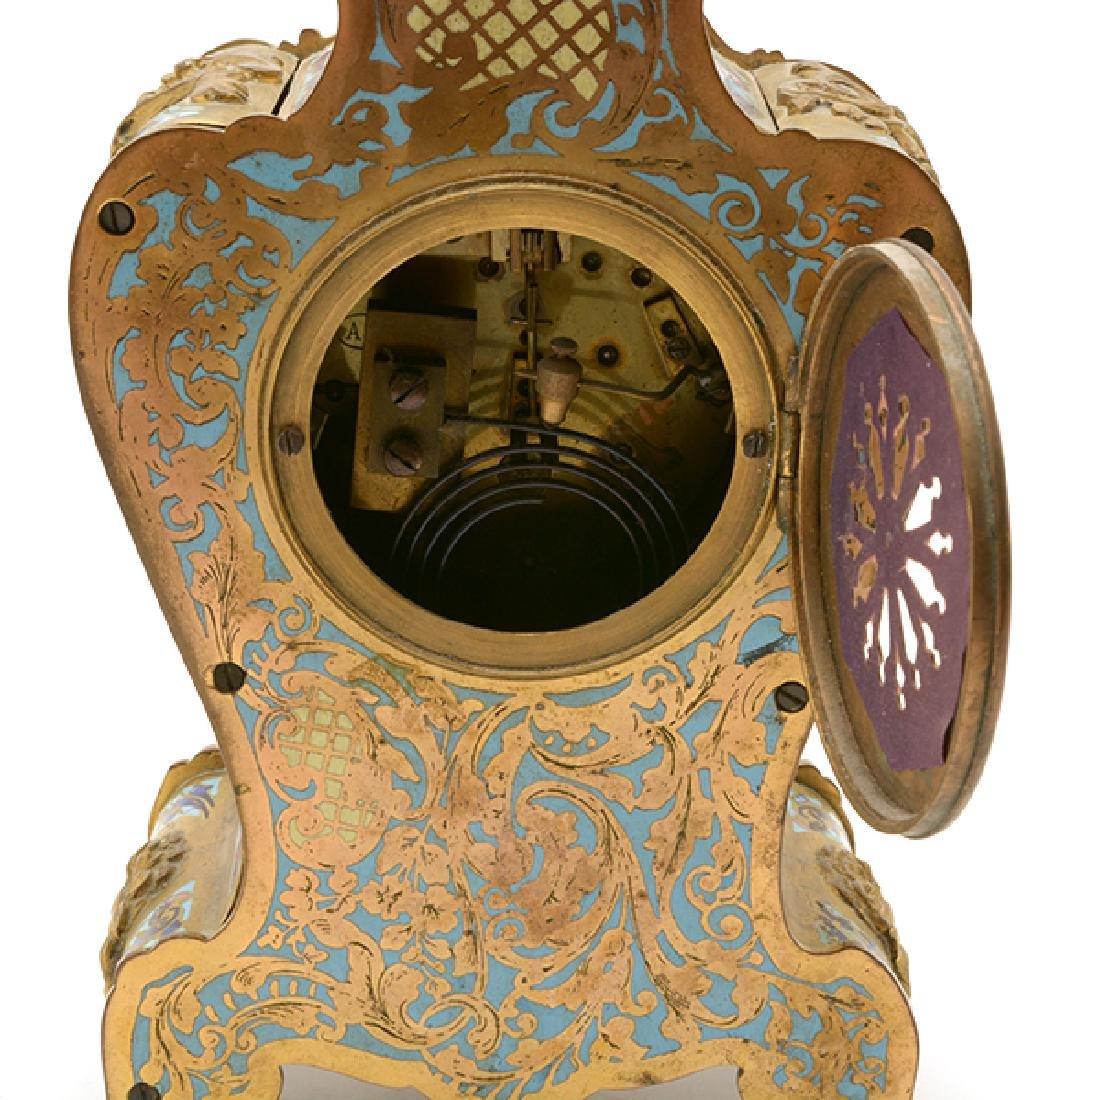 Louis XV Gilt Bronze Champleve Enamel Mantel Clock - 6